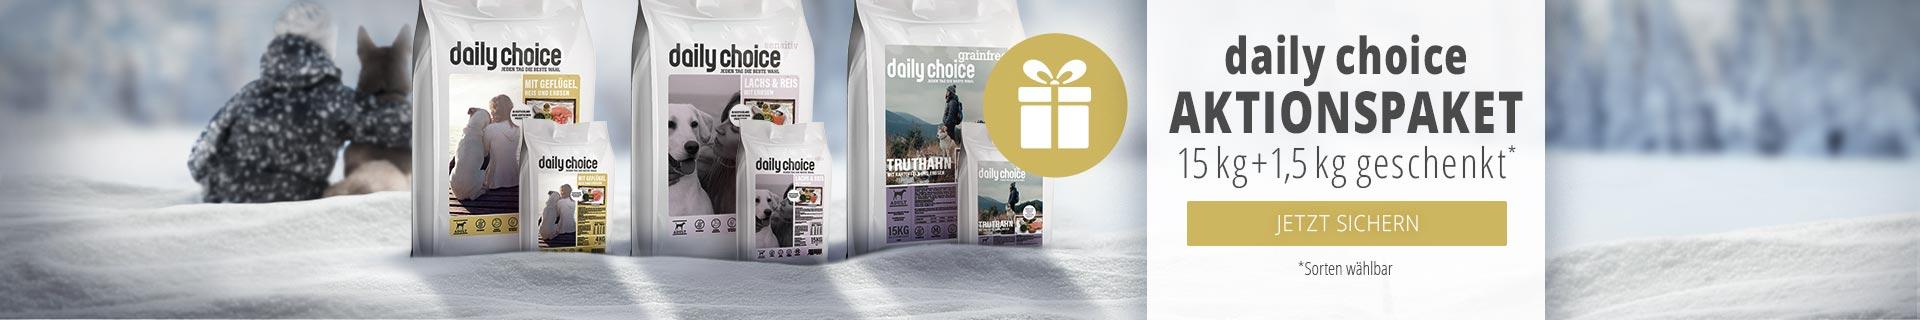 dailychoice Trockenfutter Aktionspaket - 15kg bestellen 1,5kg geschenkt